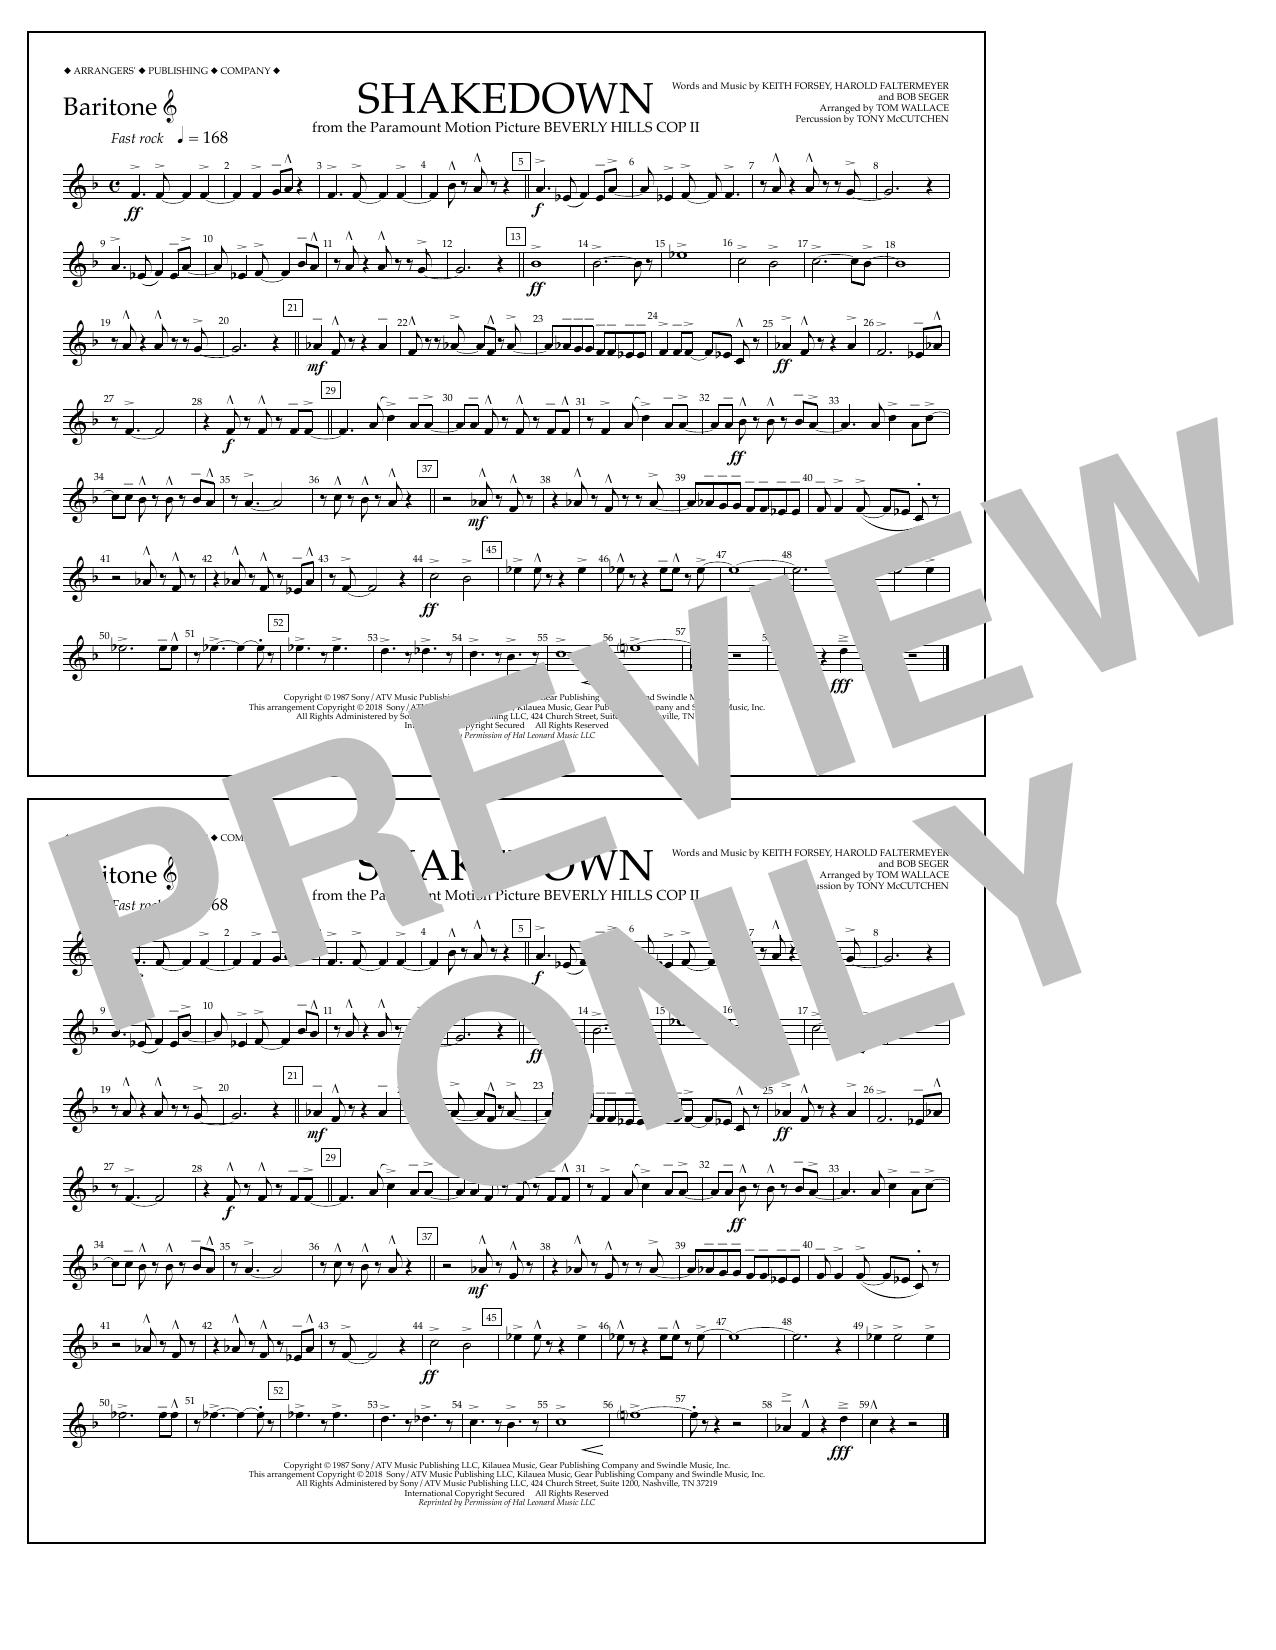 Tom Wallace Shakedown - Baritone T.C. sheet music notes and chords. Download Printable PDF.